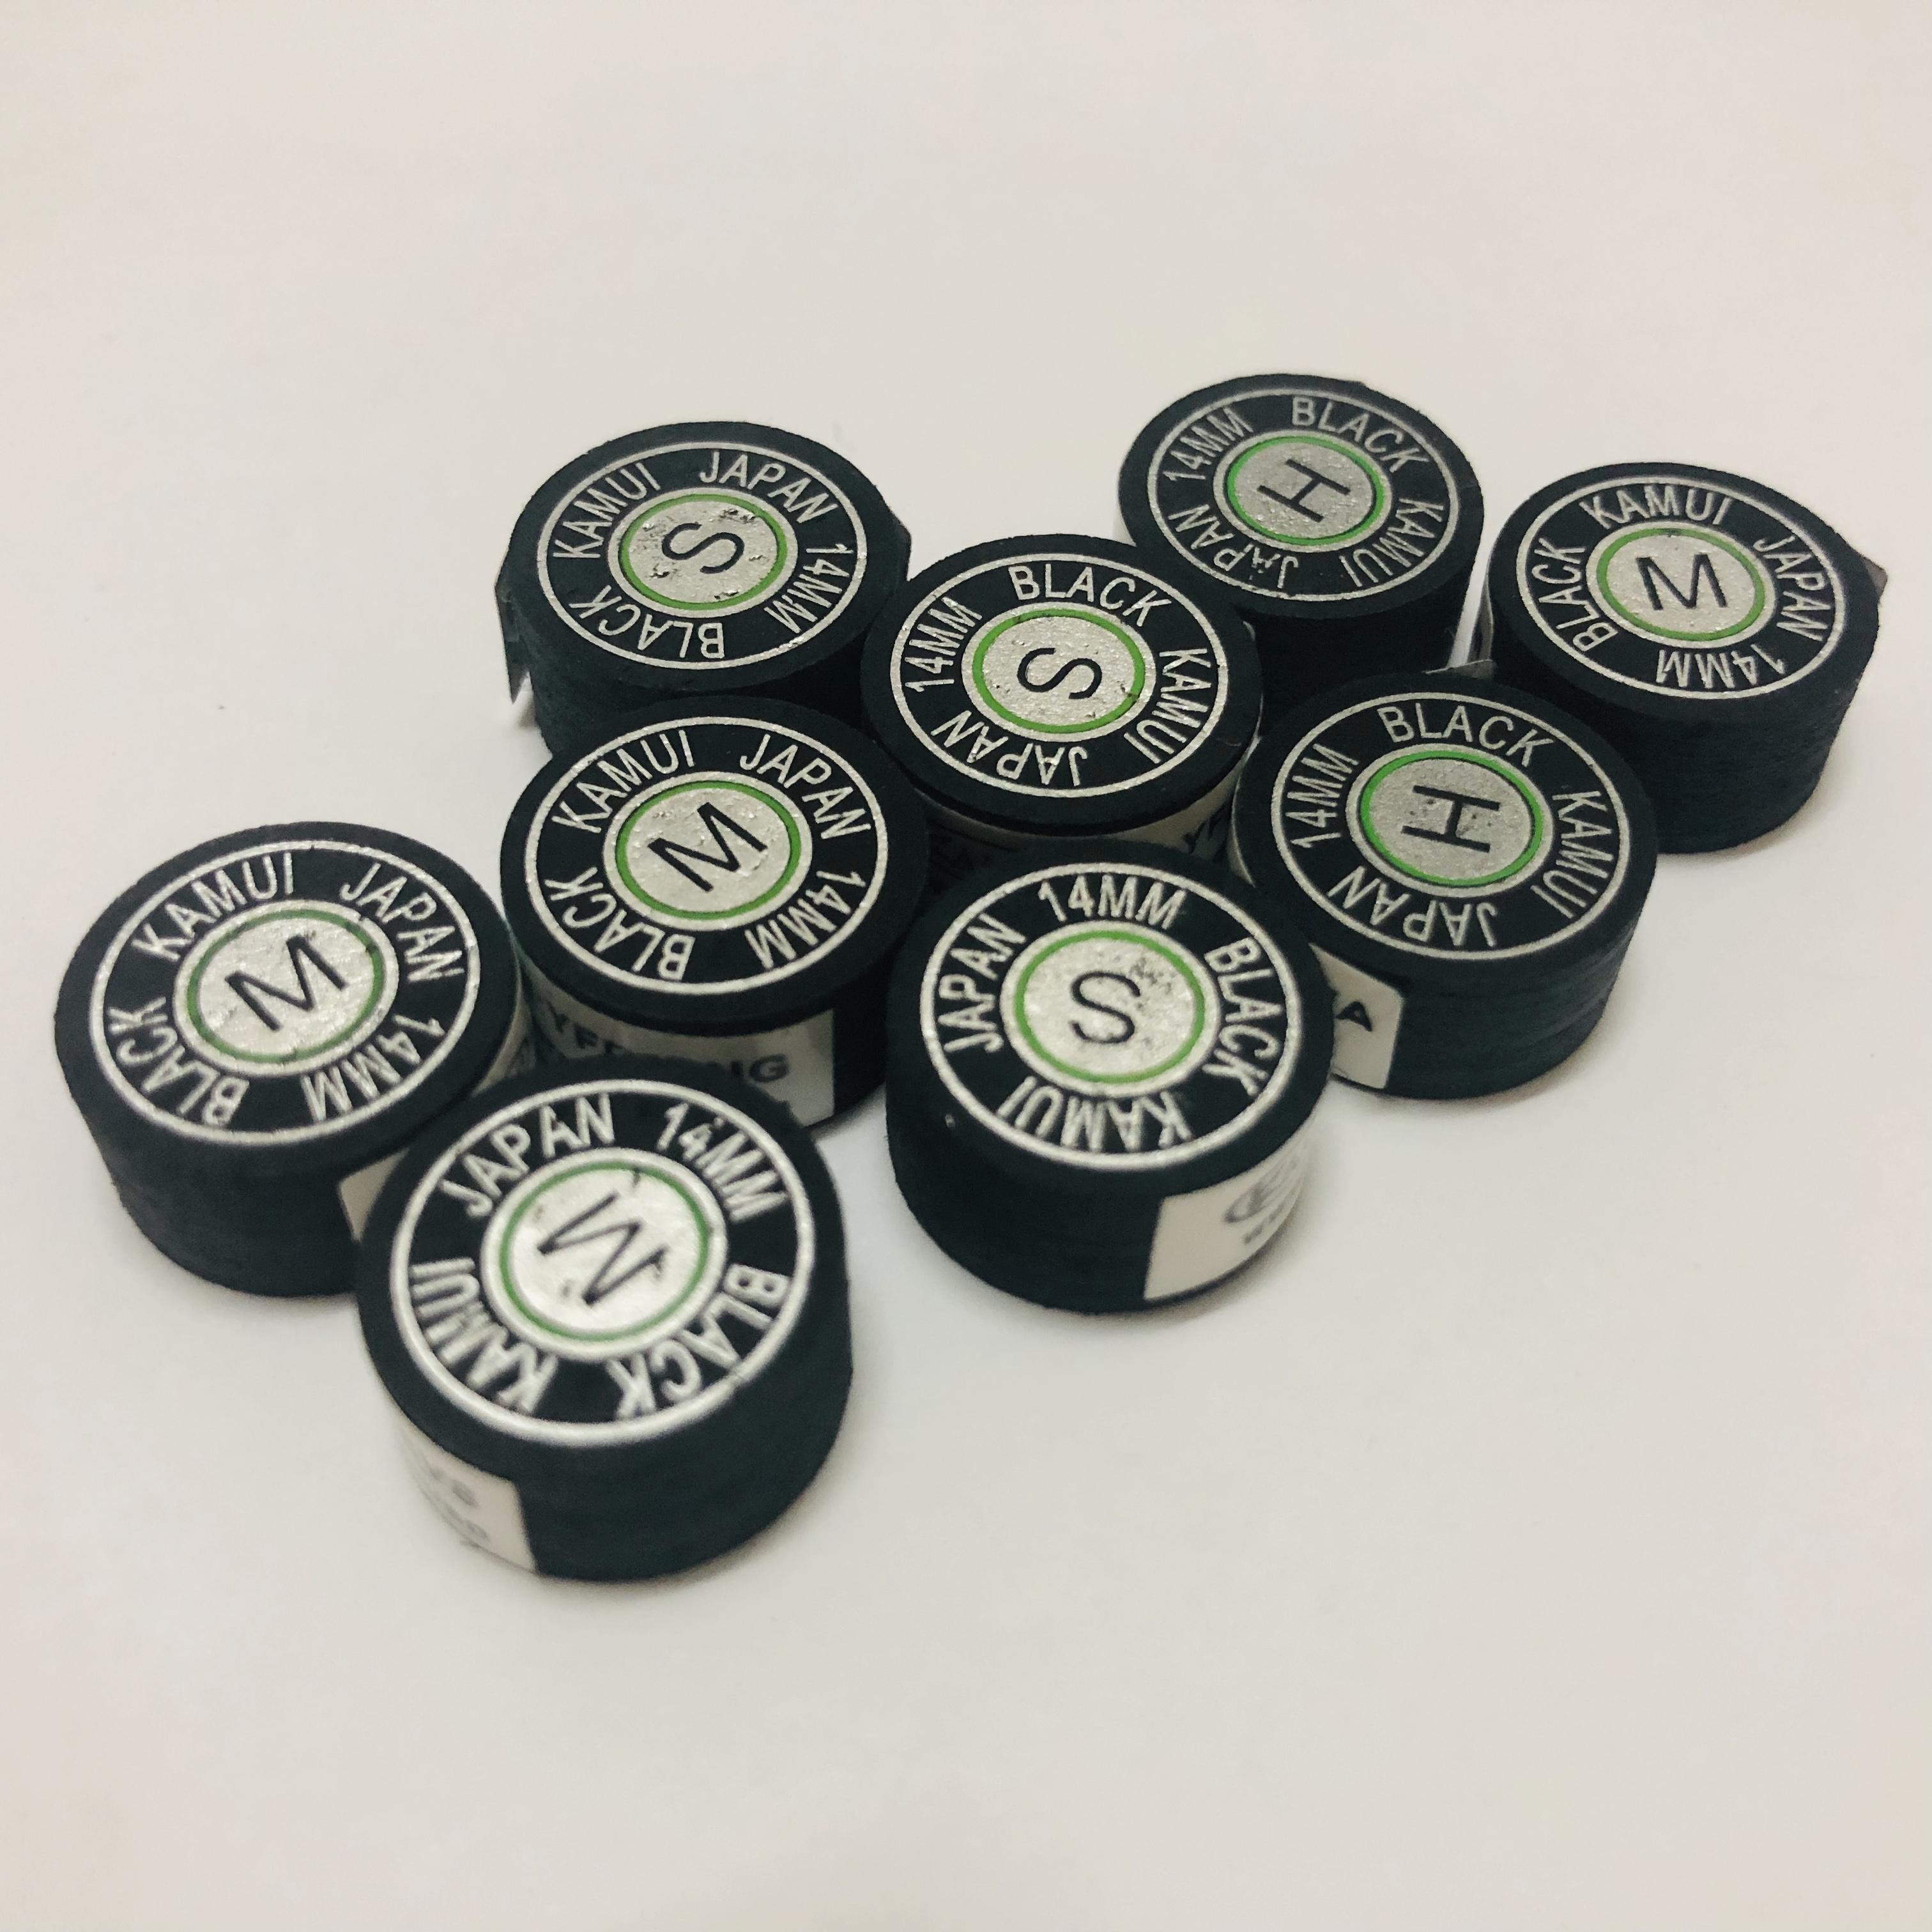 14mm black clear original kamui billiard pool cue tips